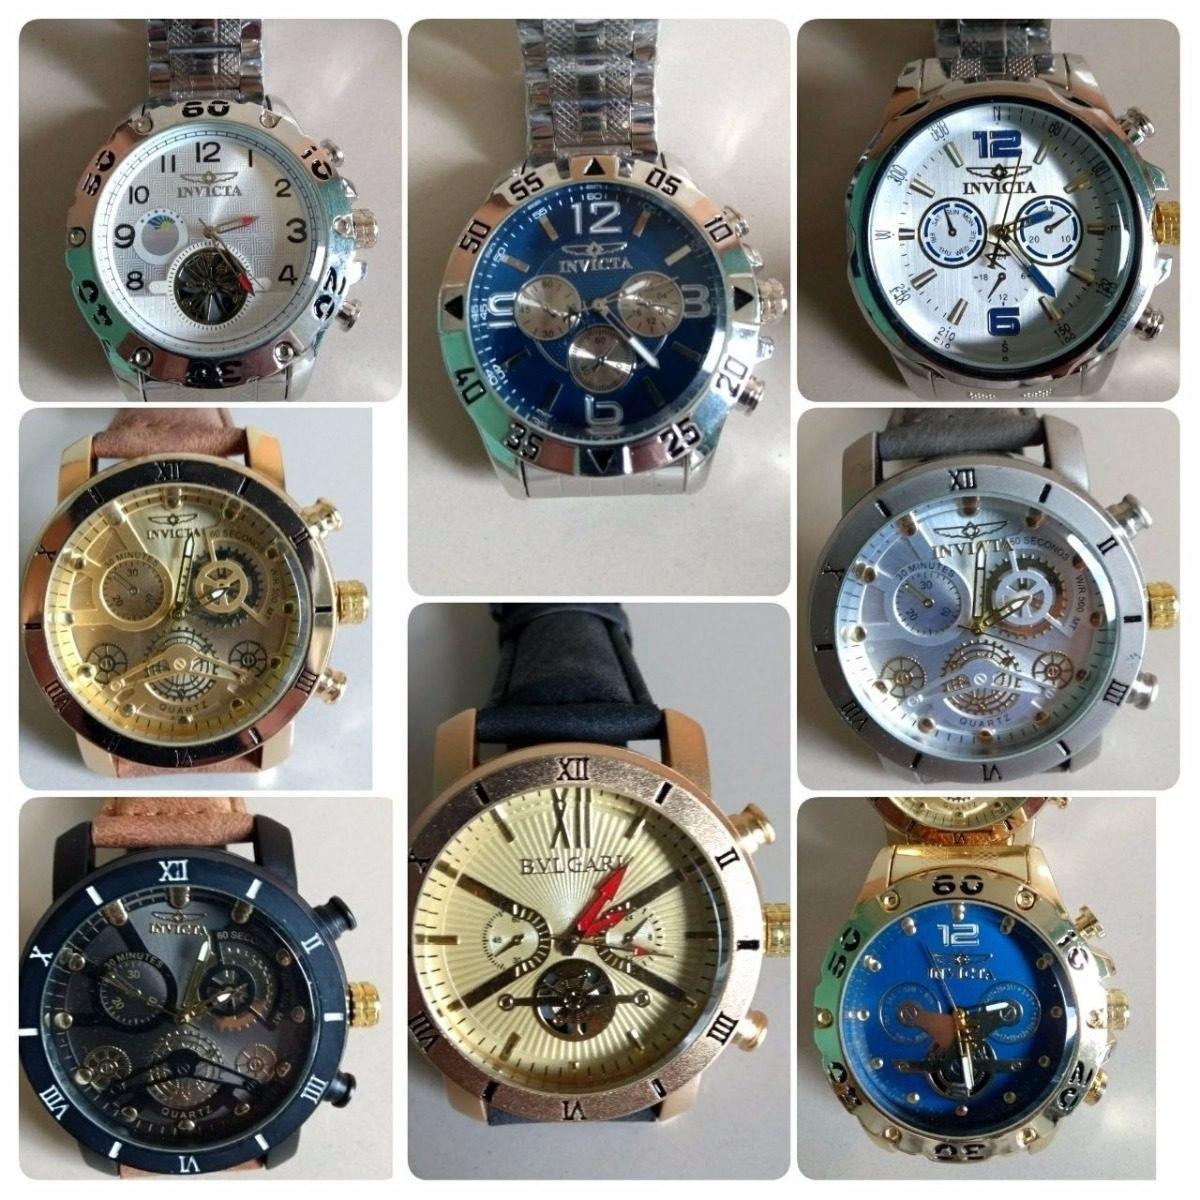 5c6803d03c8 Kit 3 Relógio Masculino Dourado Luxo P  Revender + Brinde - R  69